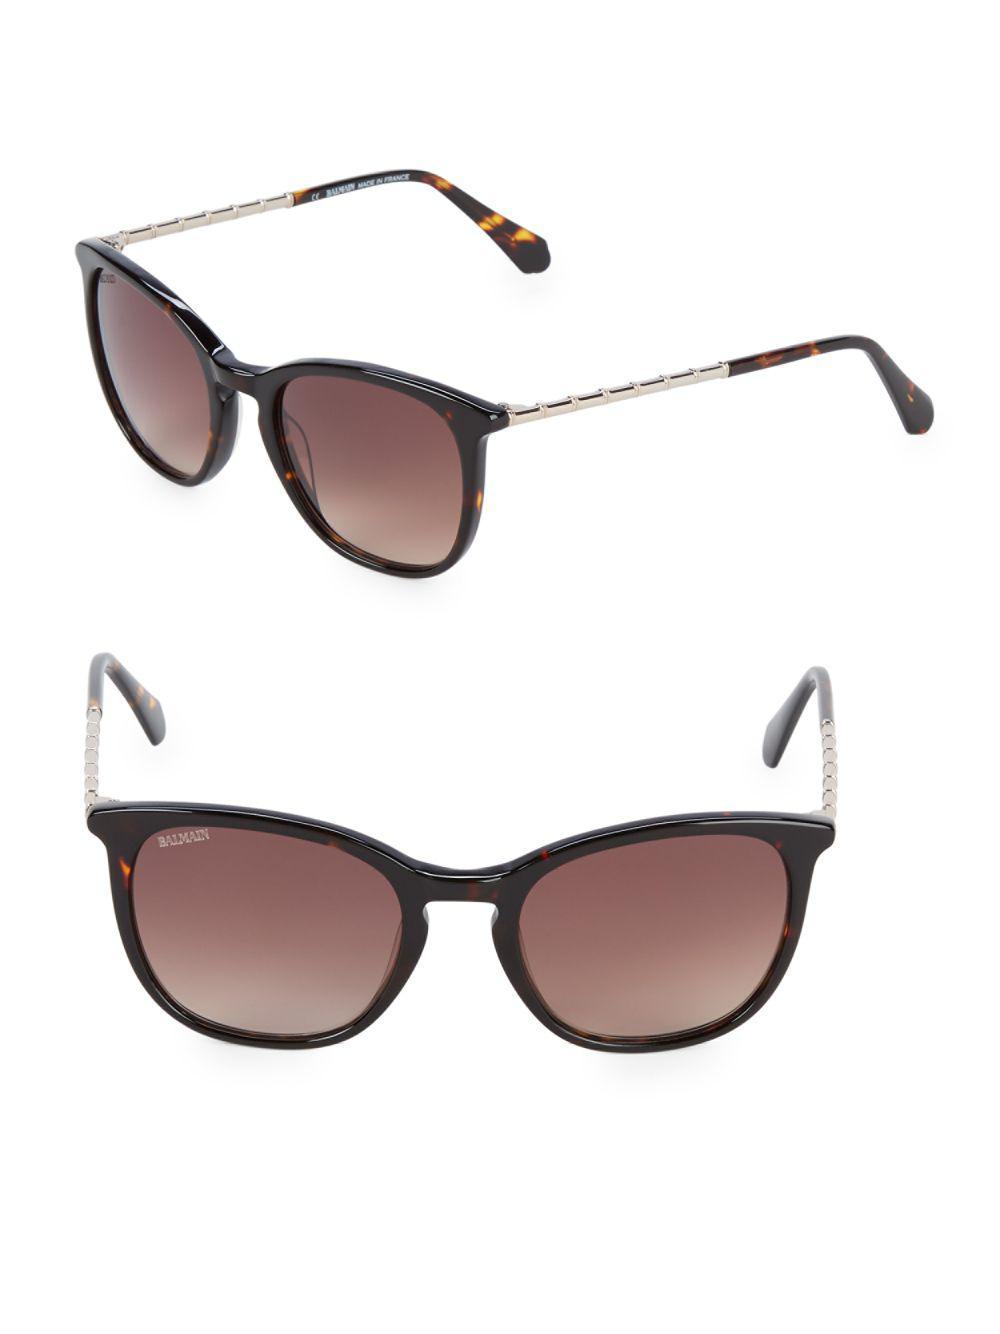 f55c9f8ea4 Lyst - Balmain Tortoise 51mm Square Sunglasses in Brown